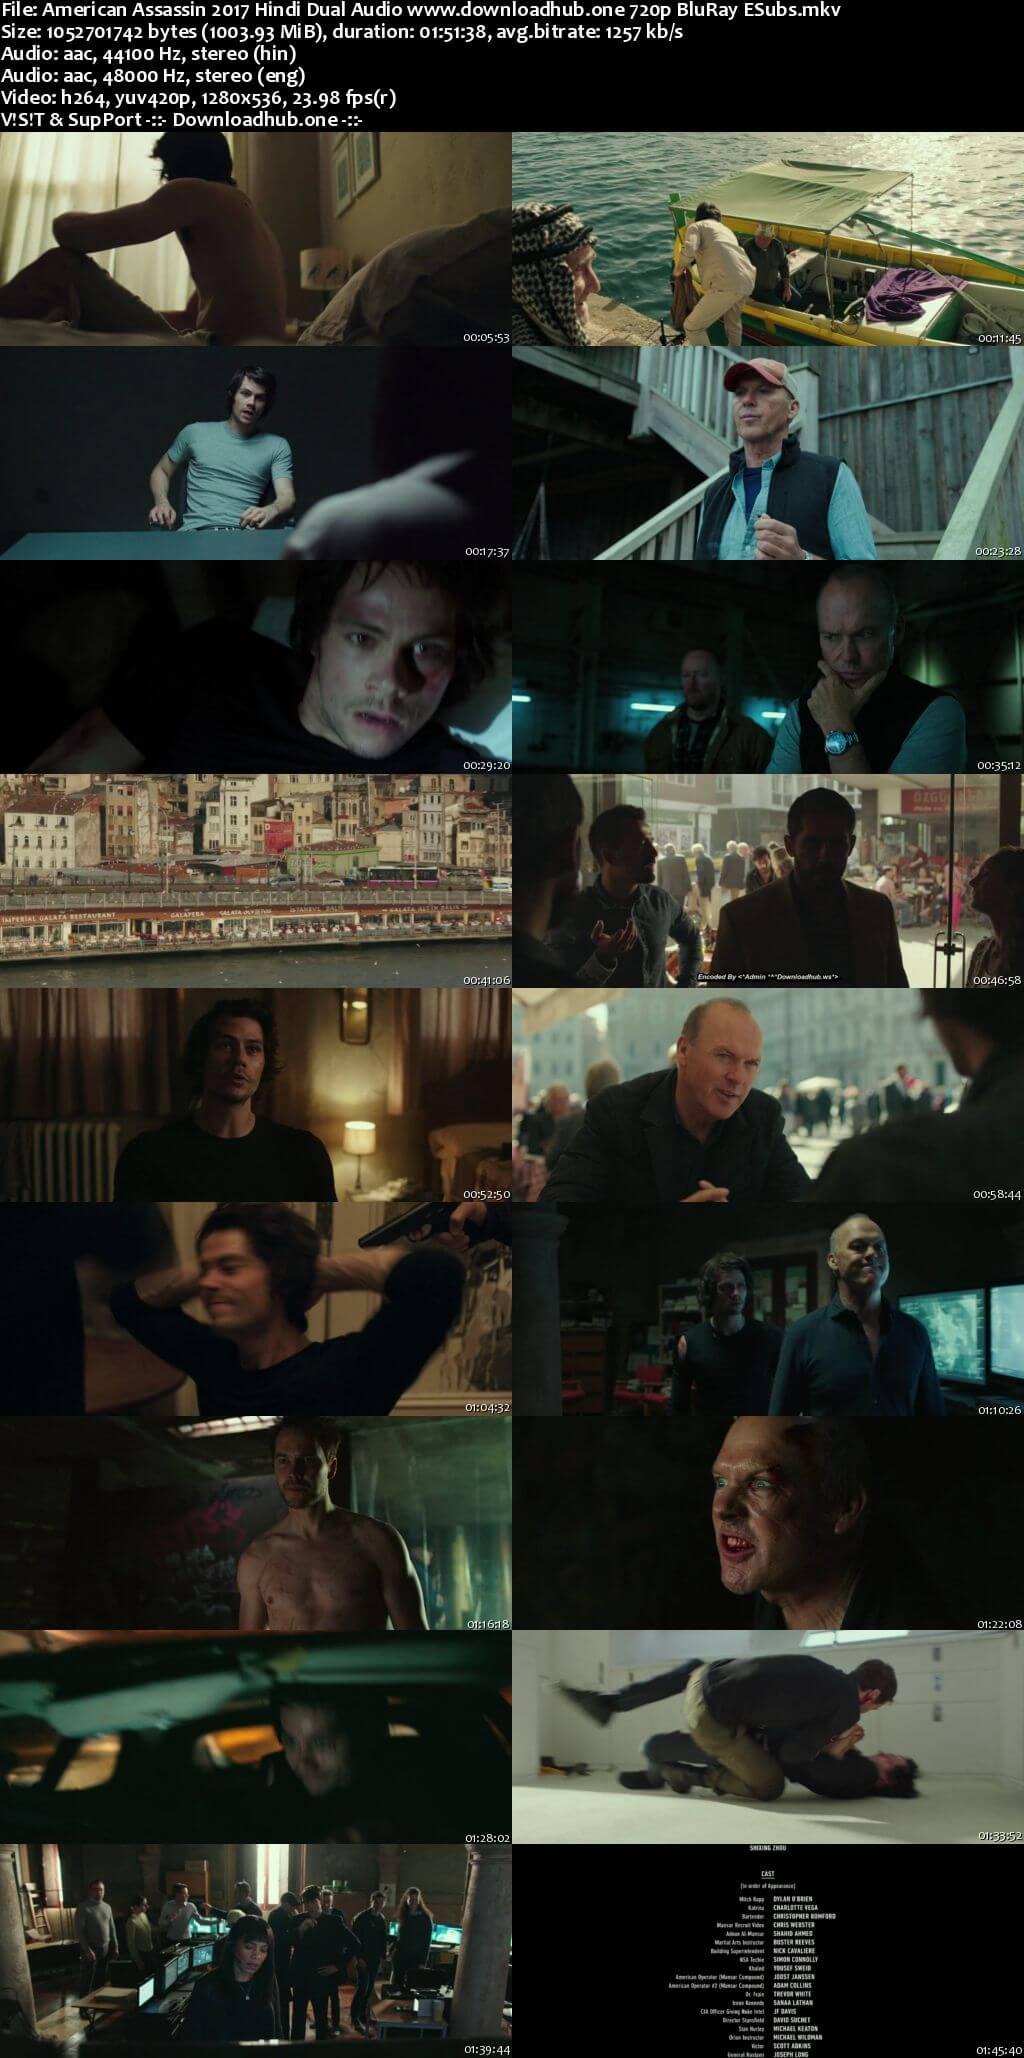 Download American Assassin 2017 Hindi Dual Audio Movie 350MB BluRay 480p ESubs